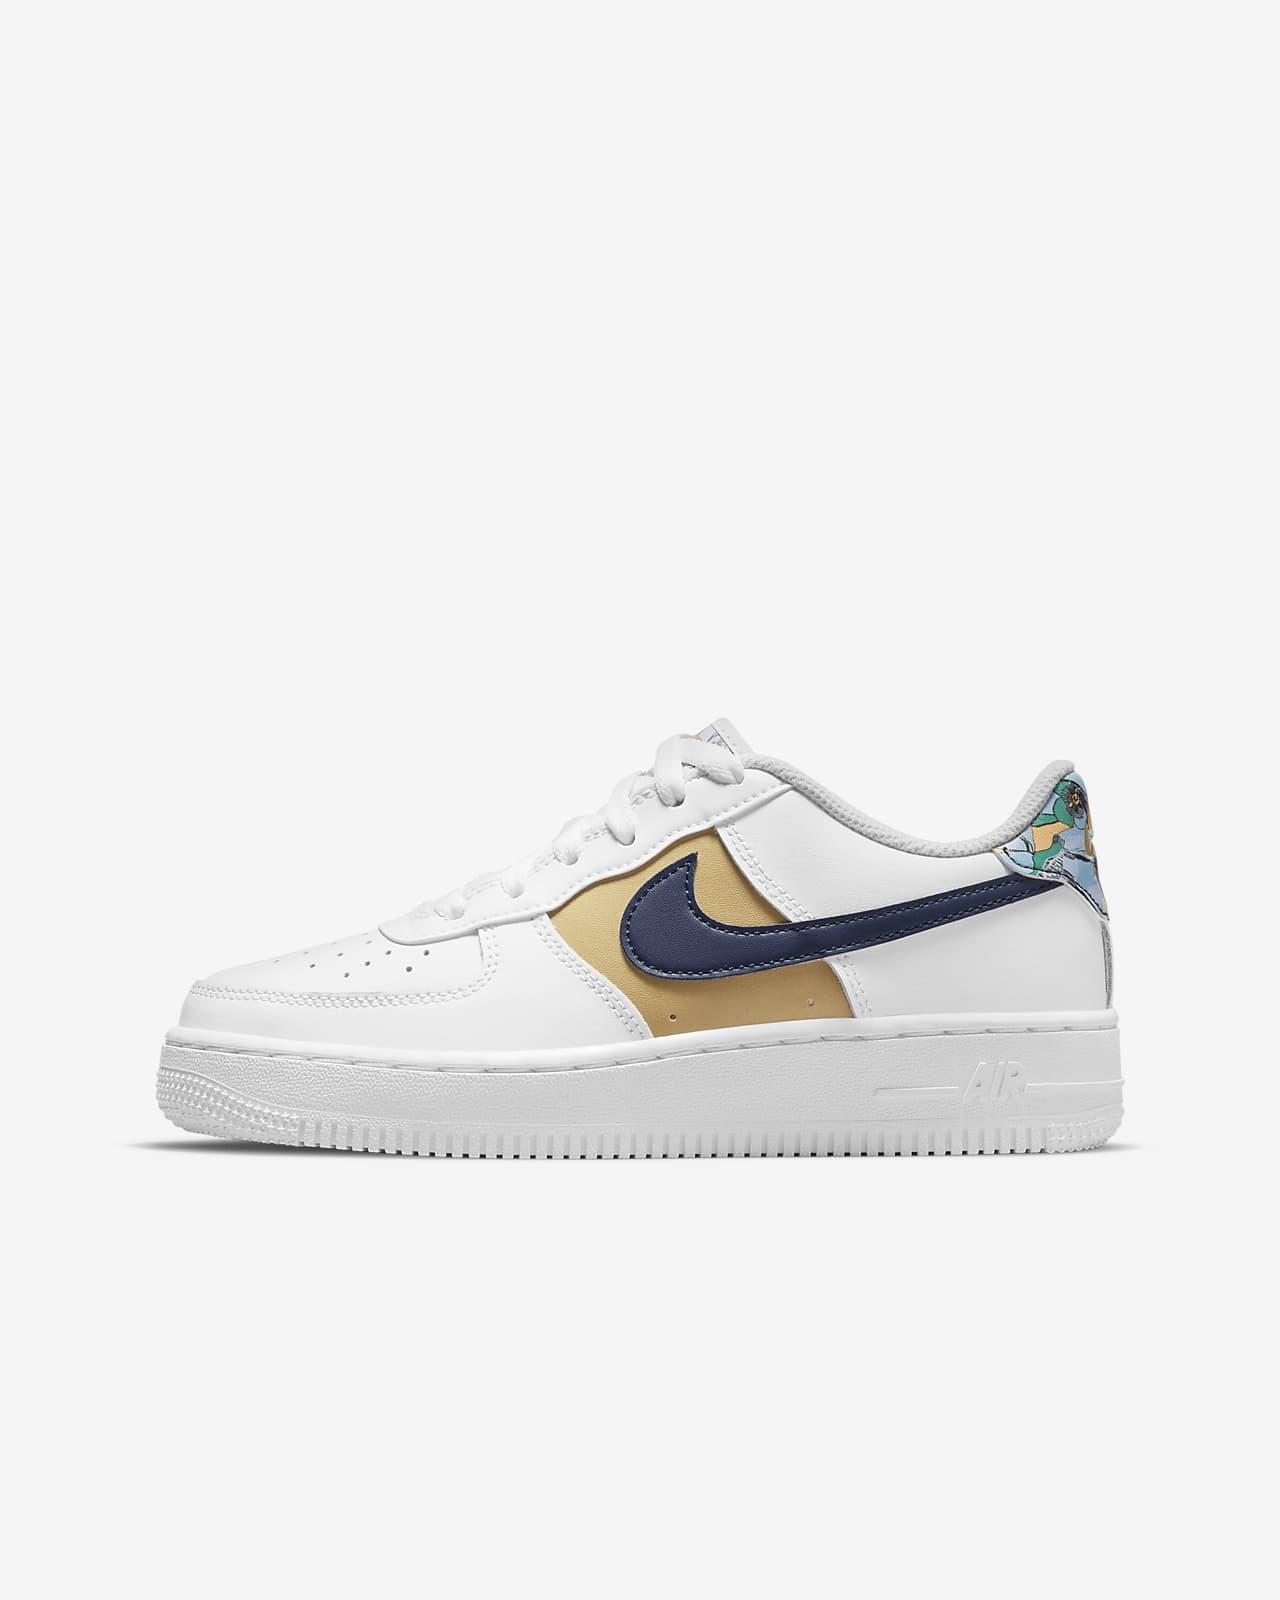 Nike Air Force 1 Low LV8 Older Kids' Shoe